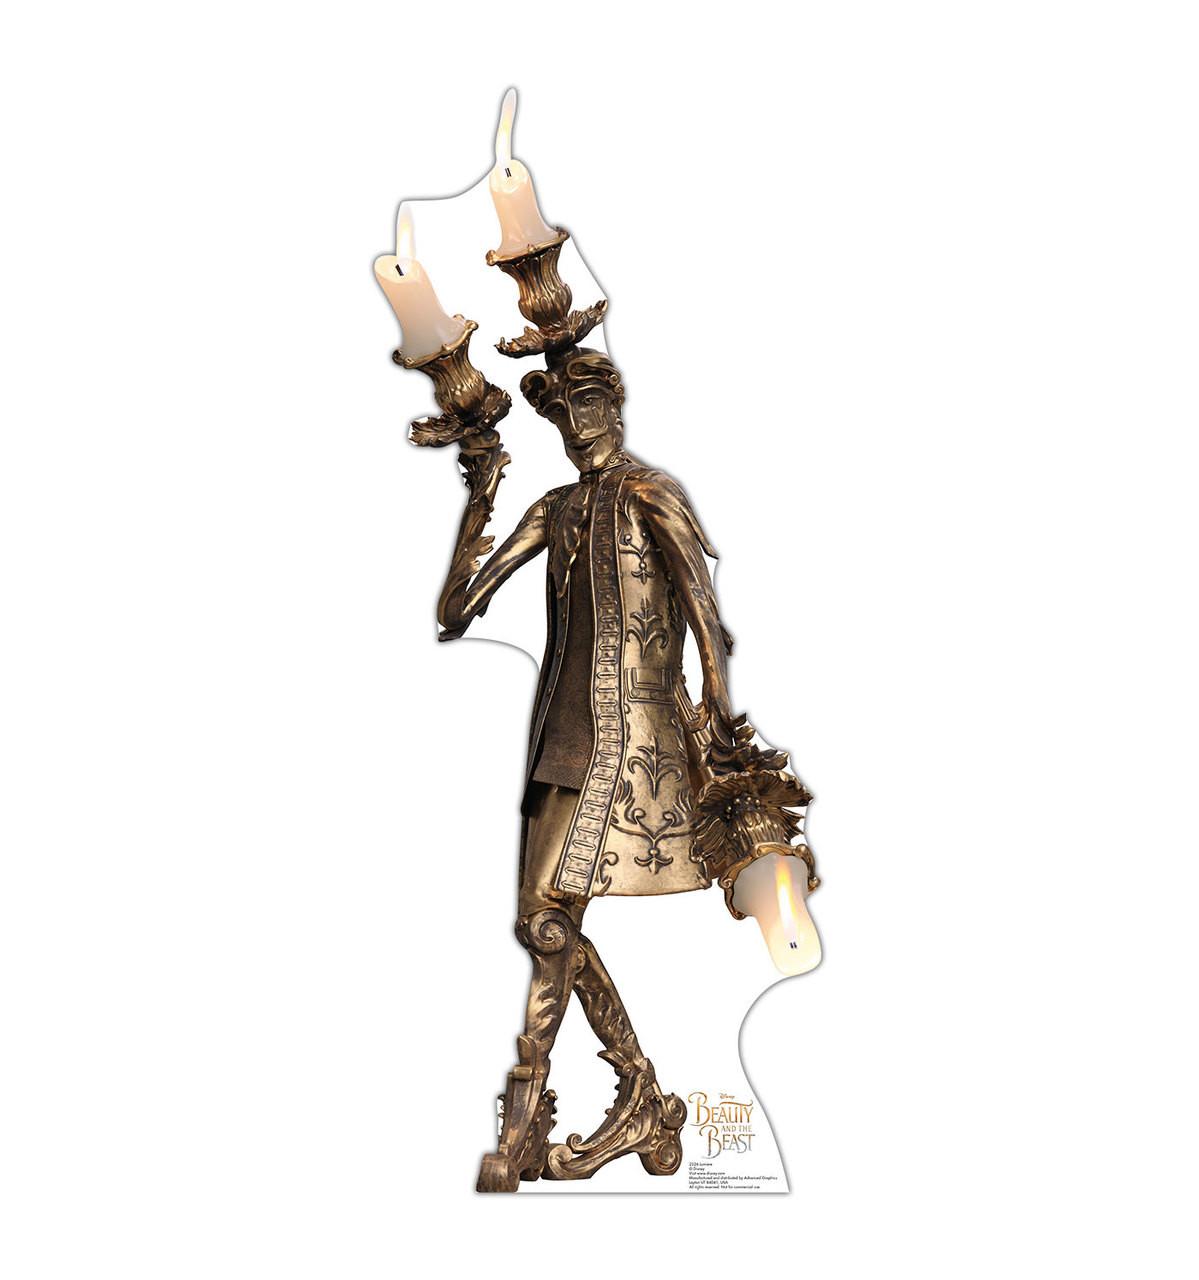 Lumiere - Disney's Beauty and the Beast - Cardboard Cutout